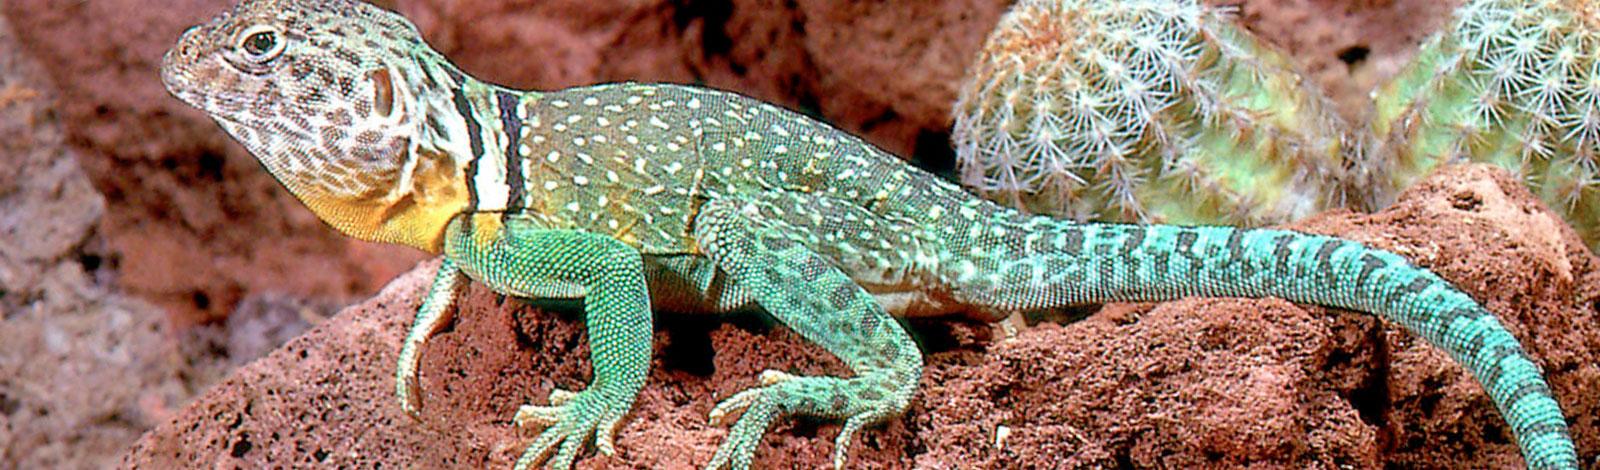 zion-lizard